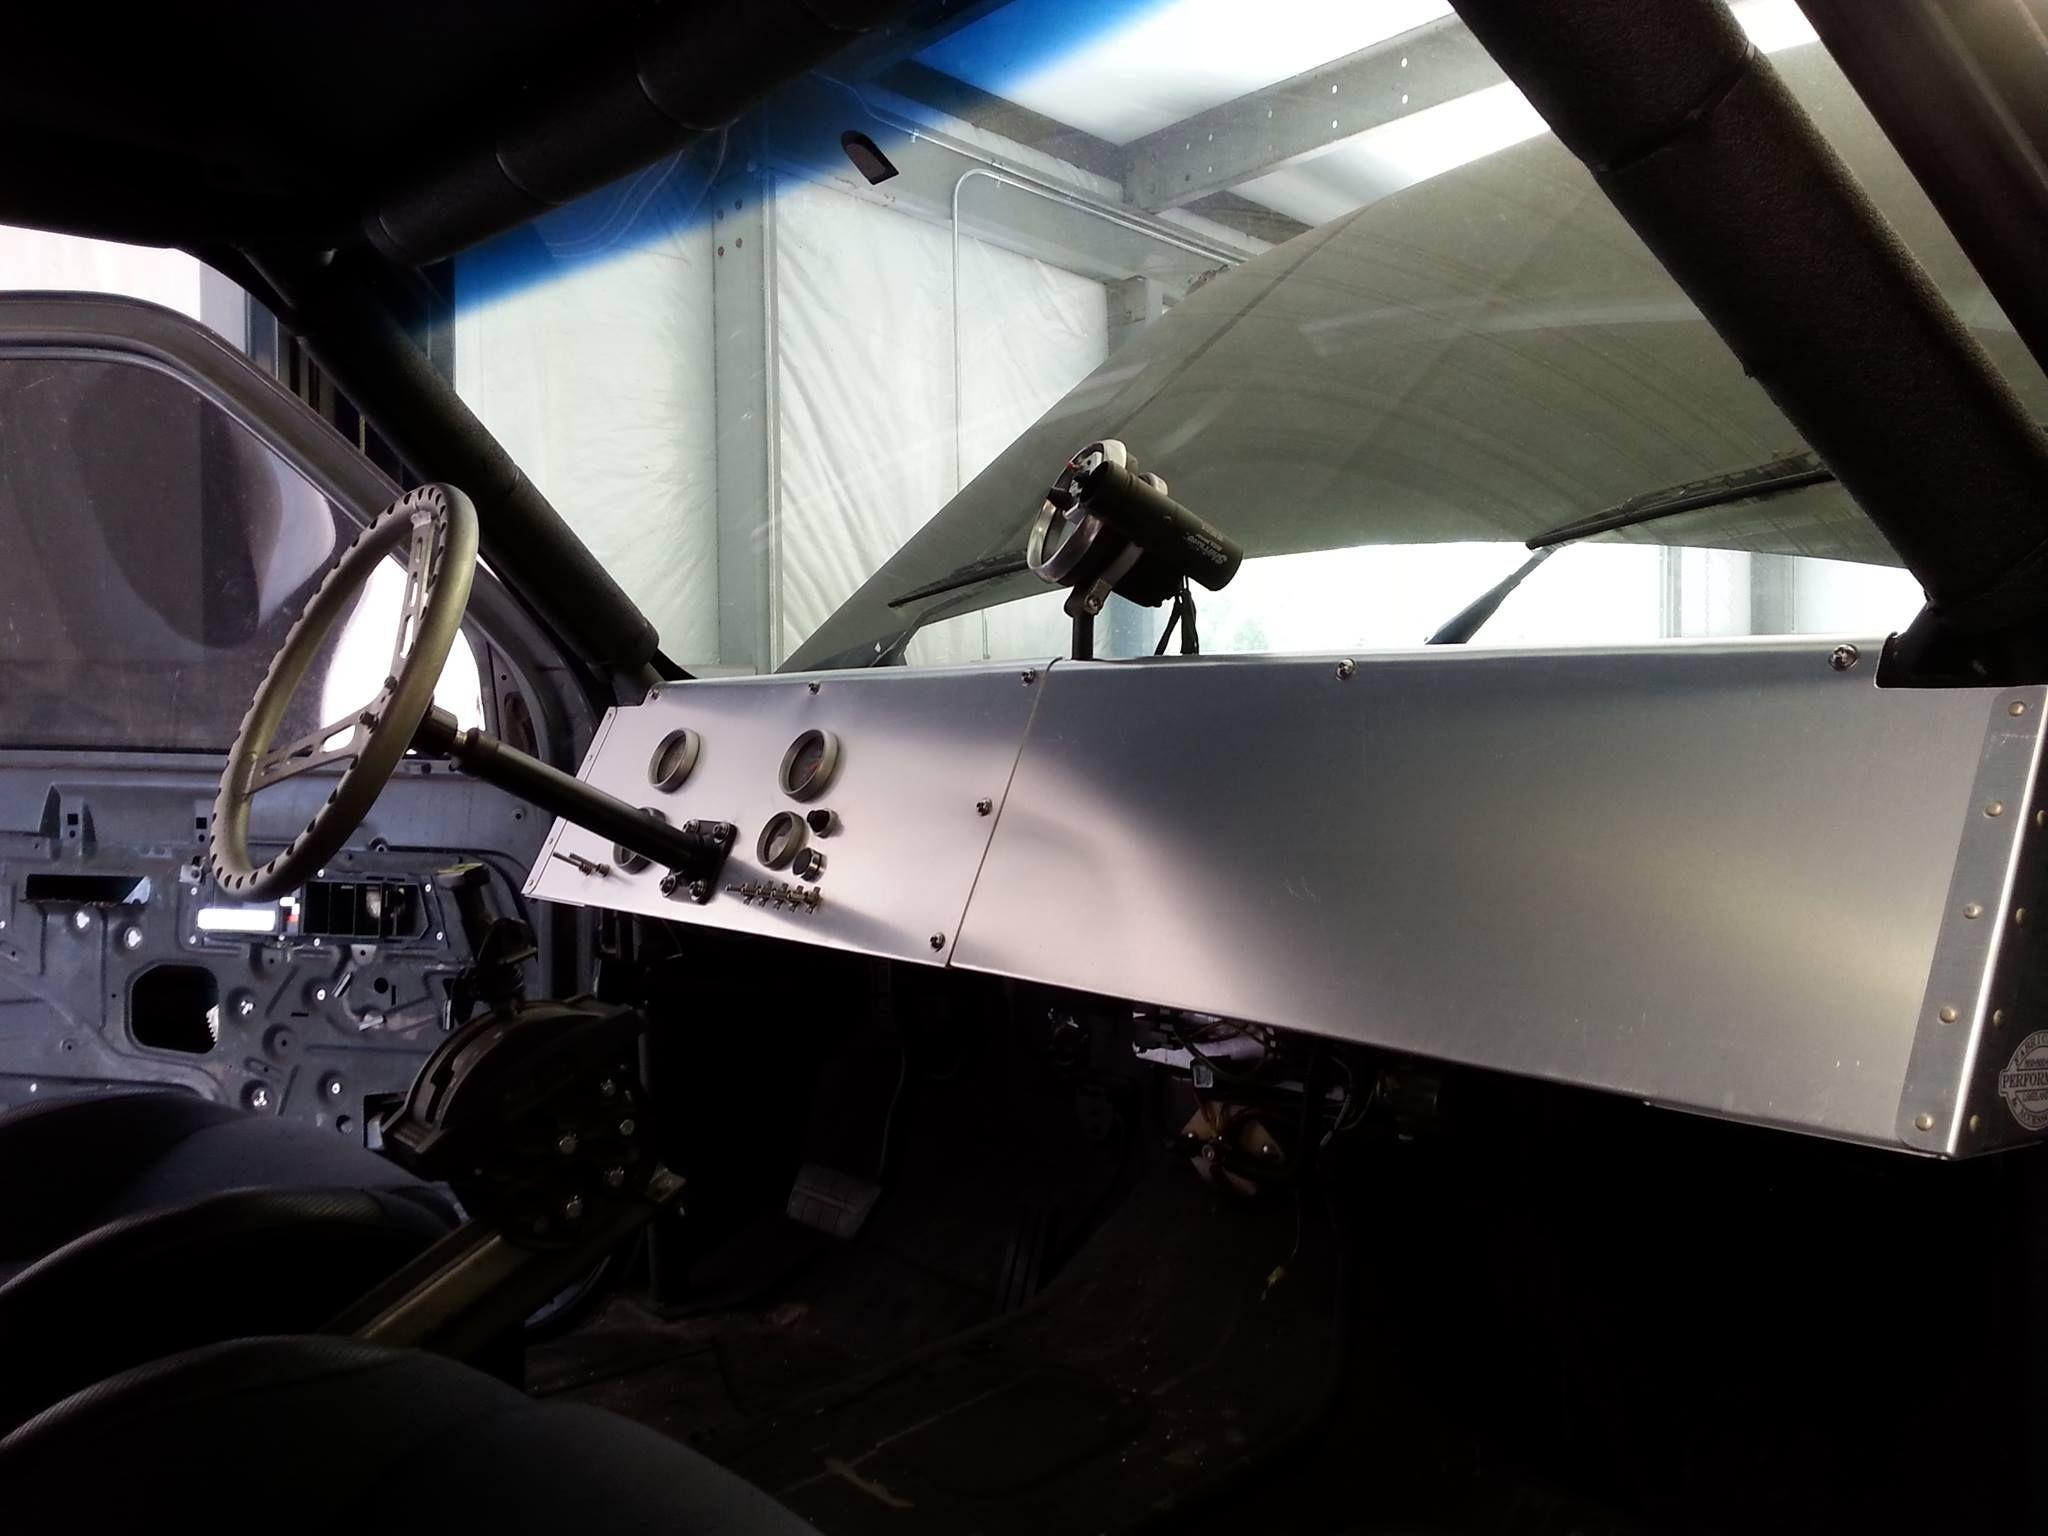 Chevy Truck aluminum dash. Sheet Metal Chevy trucks